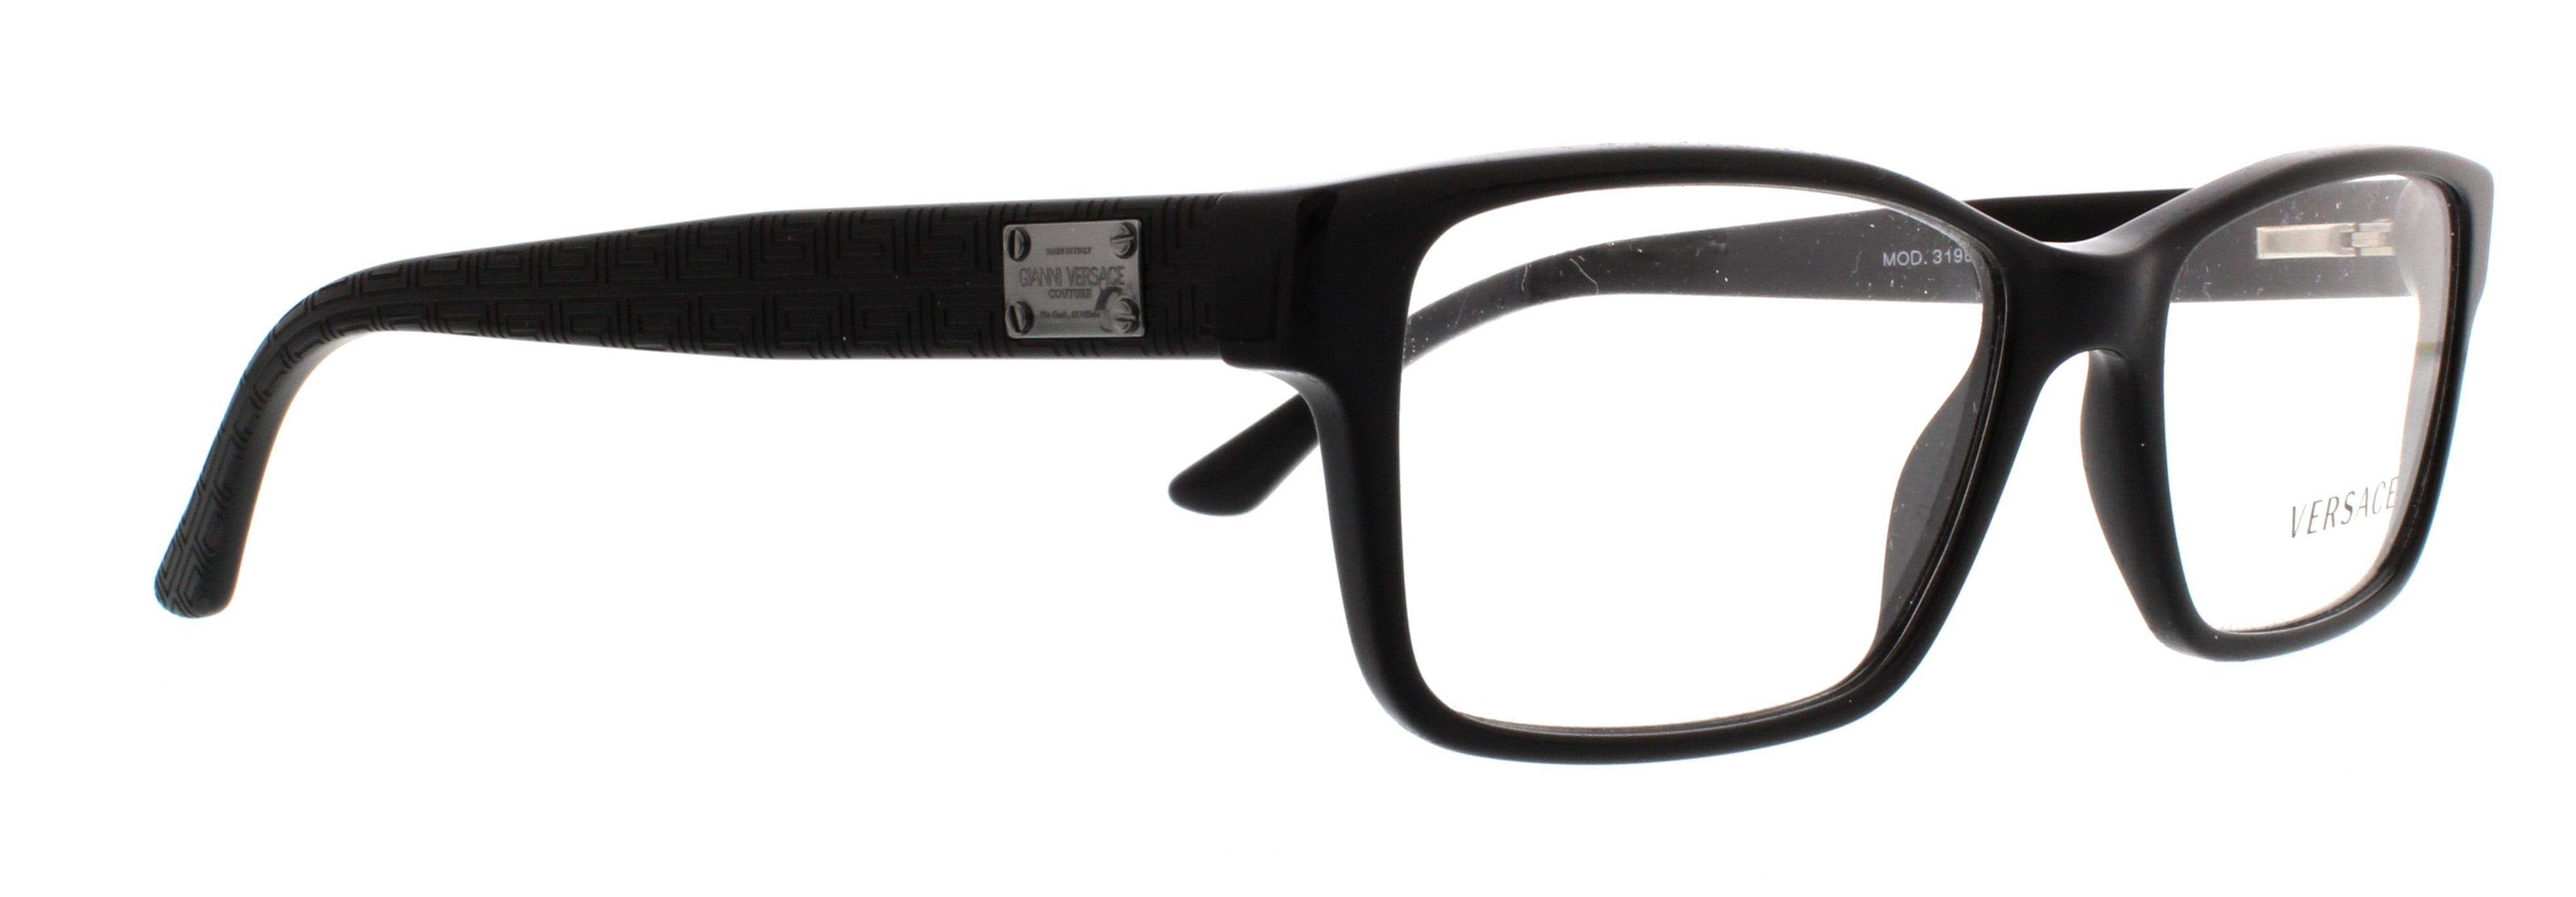 VERSACE Eyeglasses VE3198 GB1 Black 55MM - Walmart.com